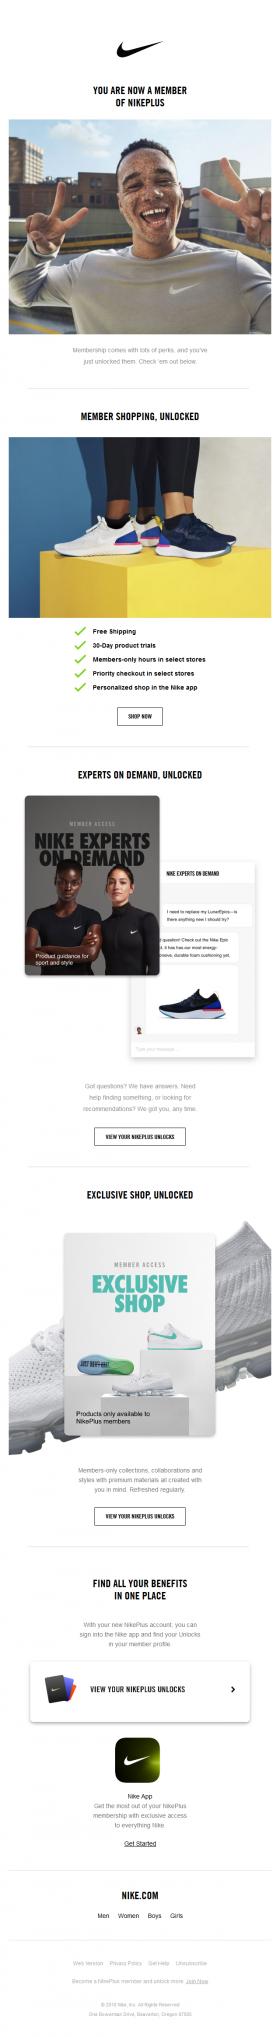 save off cbd15 90b89 Welcome to your NikePlus membership